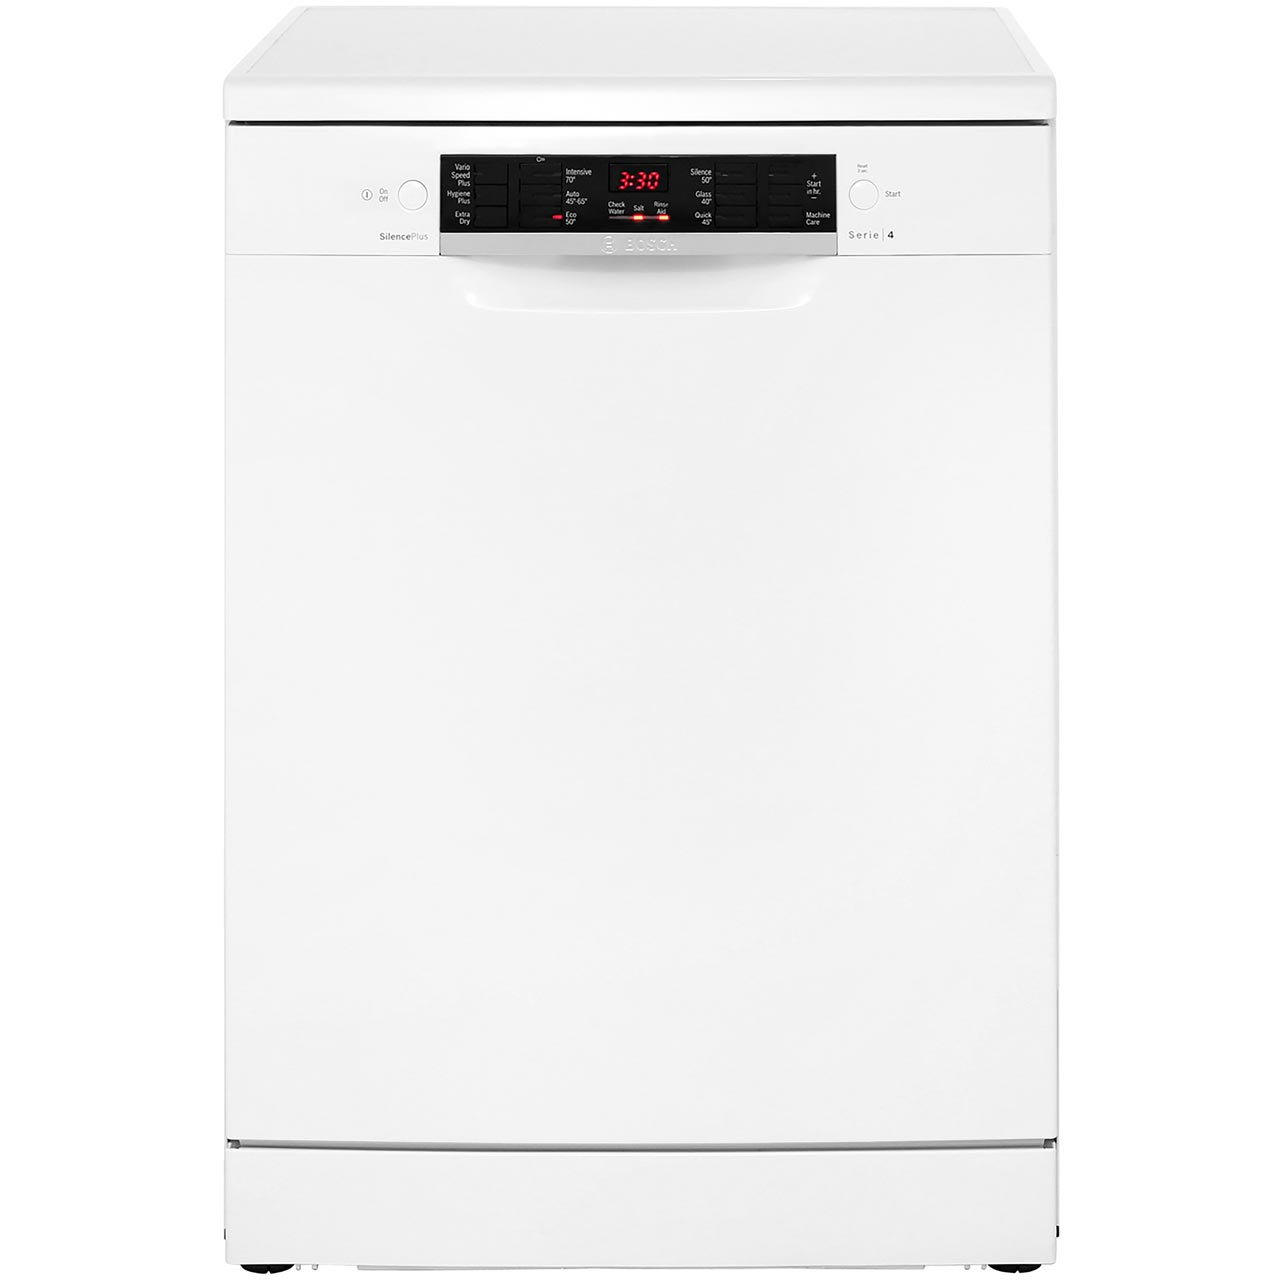 SMS46MW01G_WH | Bosch freestanding dishwasher | ao.com